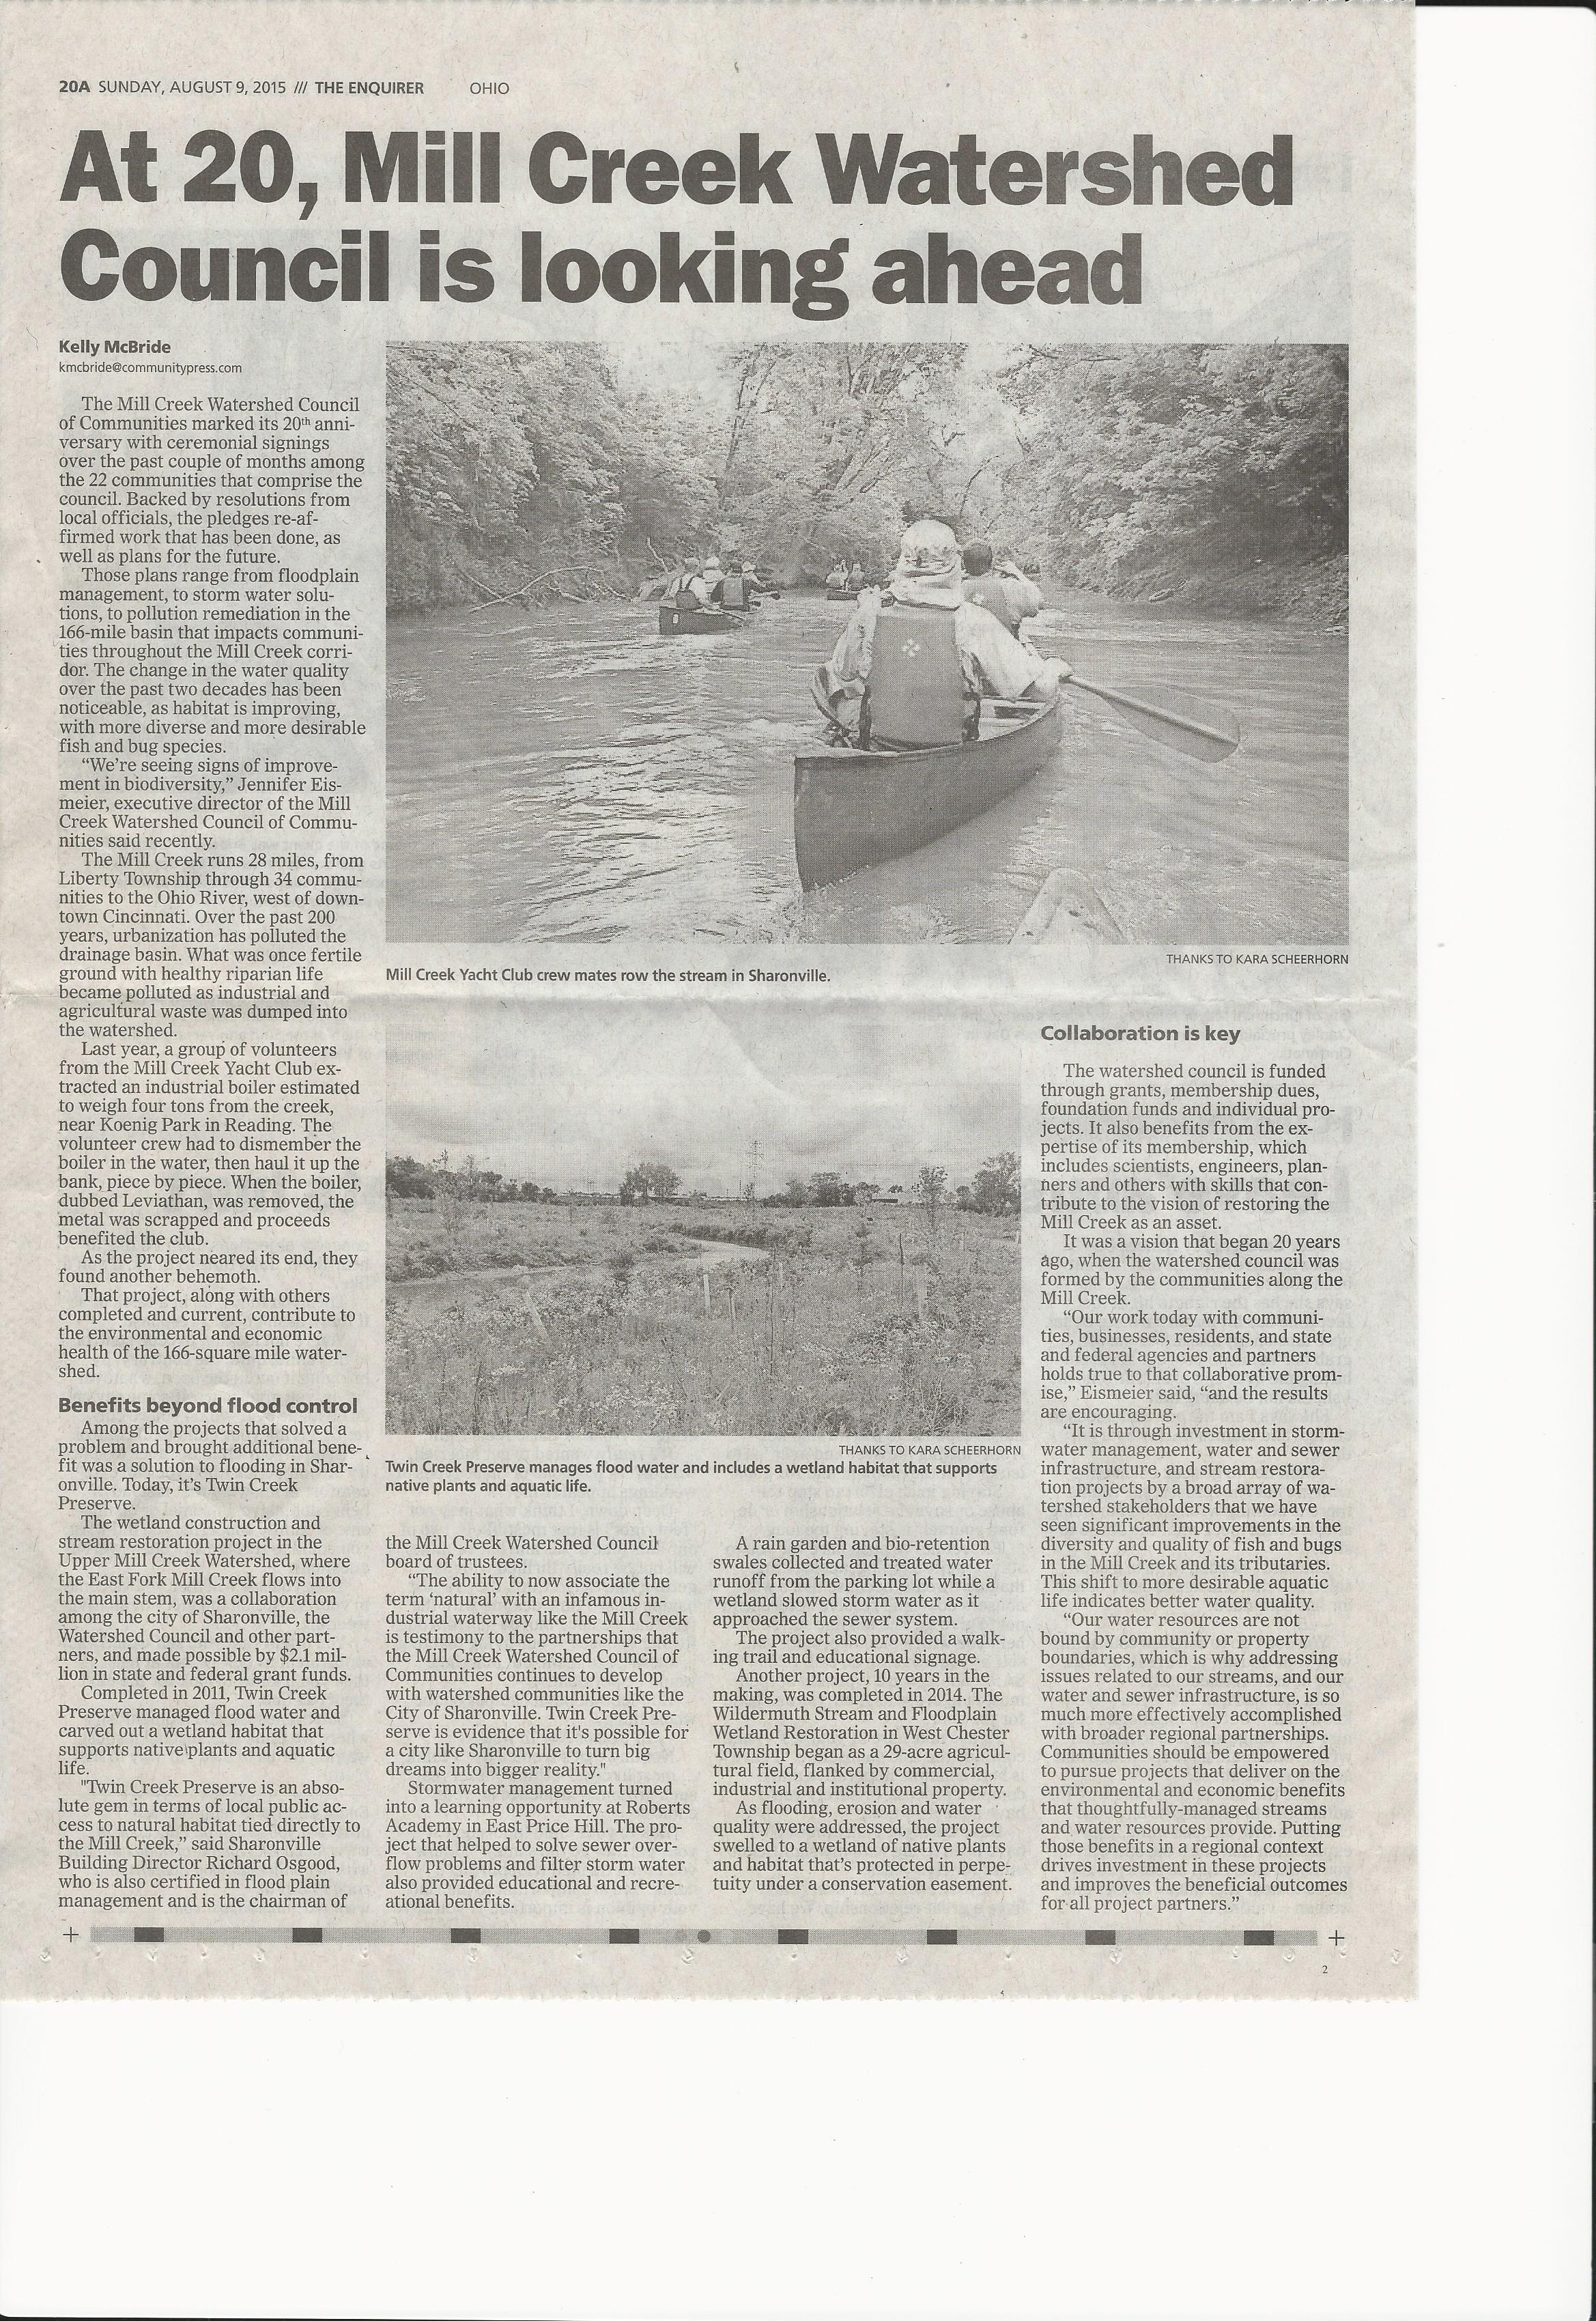 Cincinnati Enquirer_Council's 20th_08_09_15.jpg